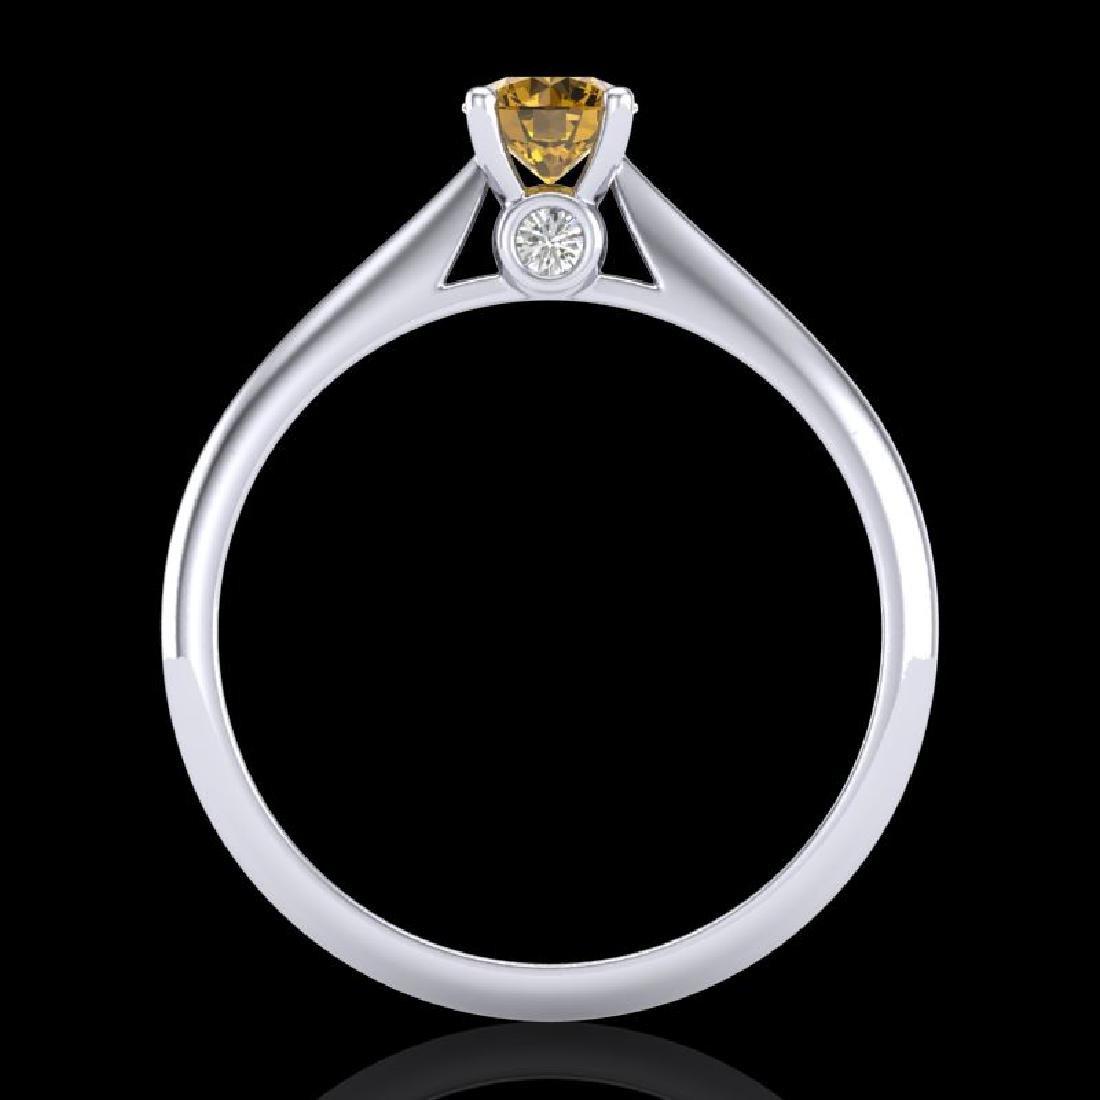 0.4 CTW Intense Fancy Yellow Diamond Engagement Art - 3